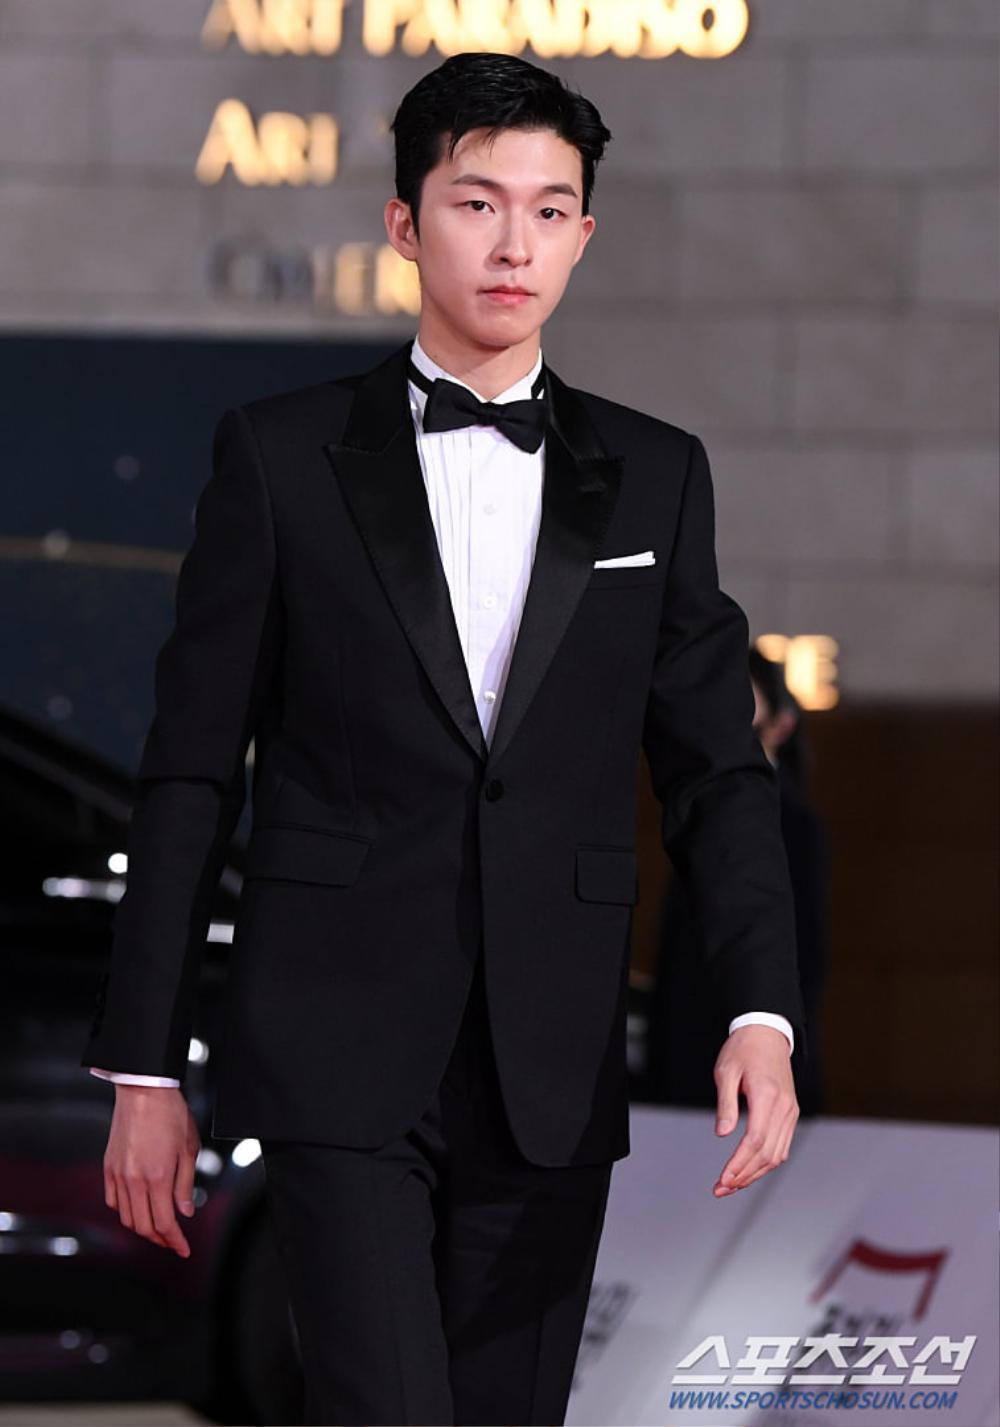 Thảm đỏ 'Rồng xanh 2020': Shin Hye Sun 'cân sắc' Shin Min Ah, Jung Woo Sung - Lee Byung Hun điển trai! Ảnh 47